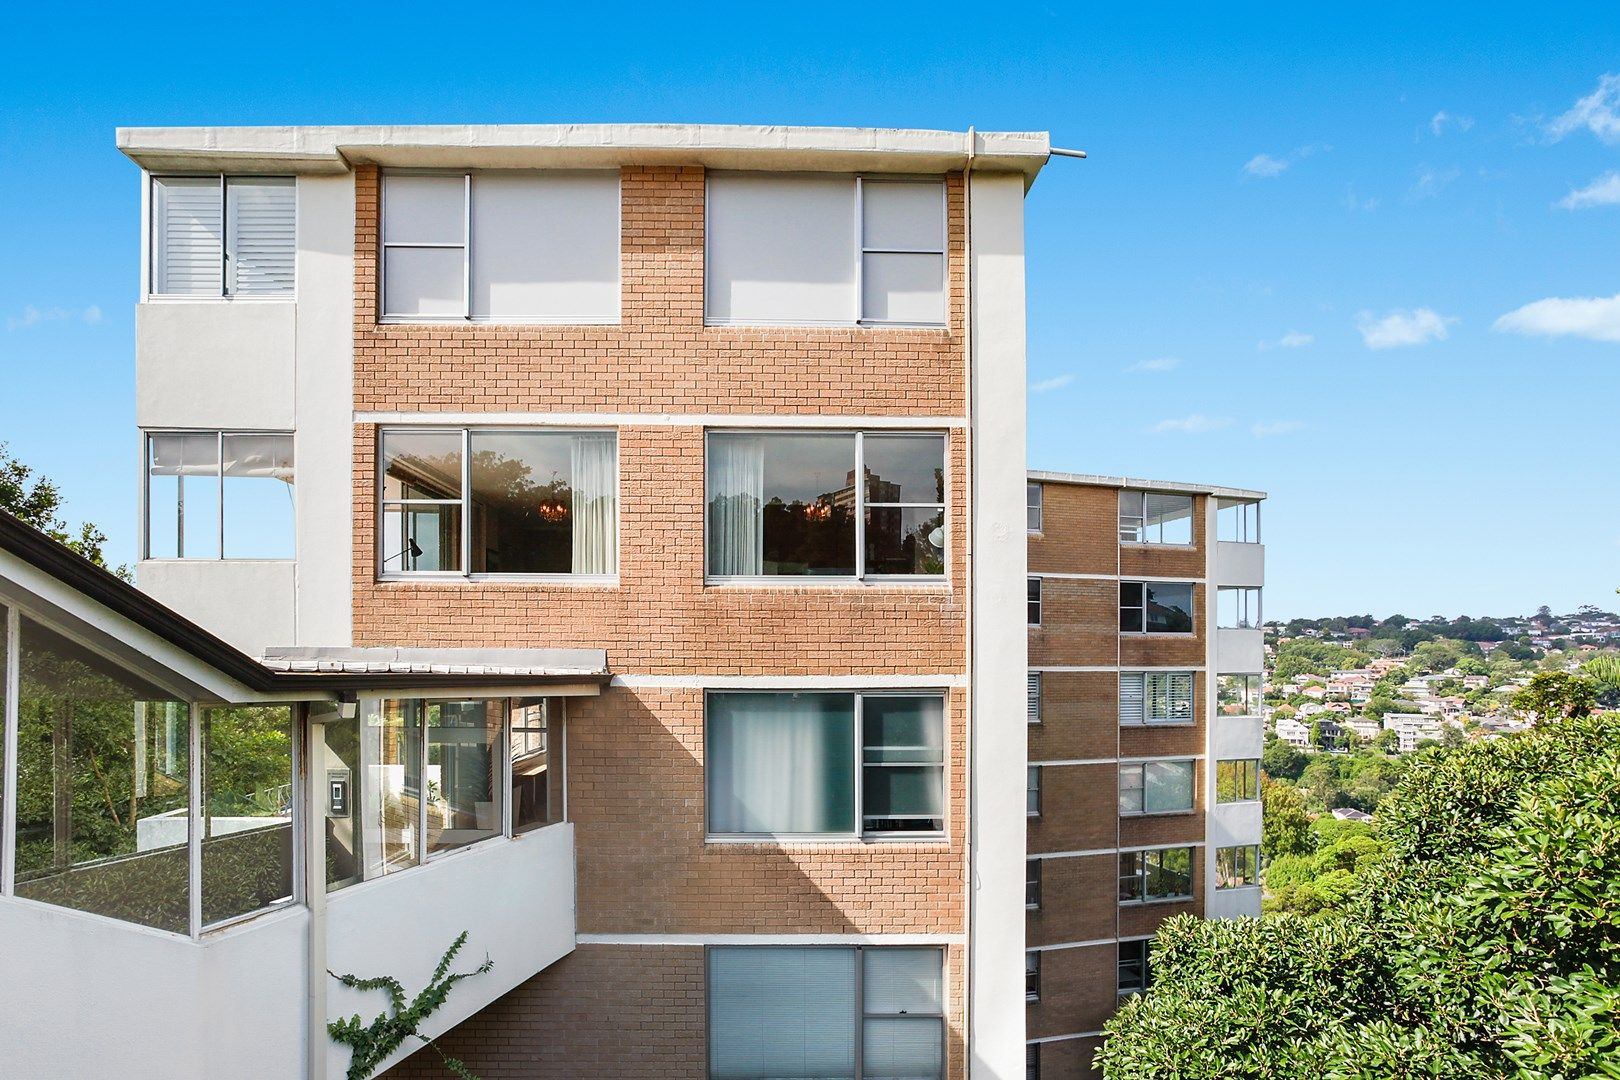 21/321 Edgecliff Road, Woollahra NSW 2025, Image 1